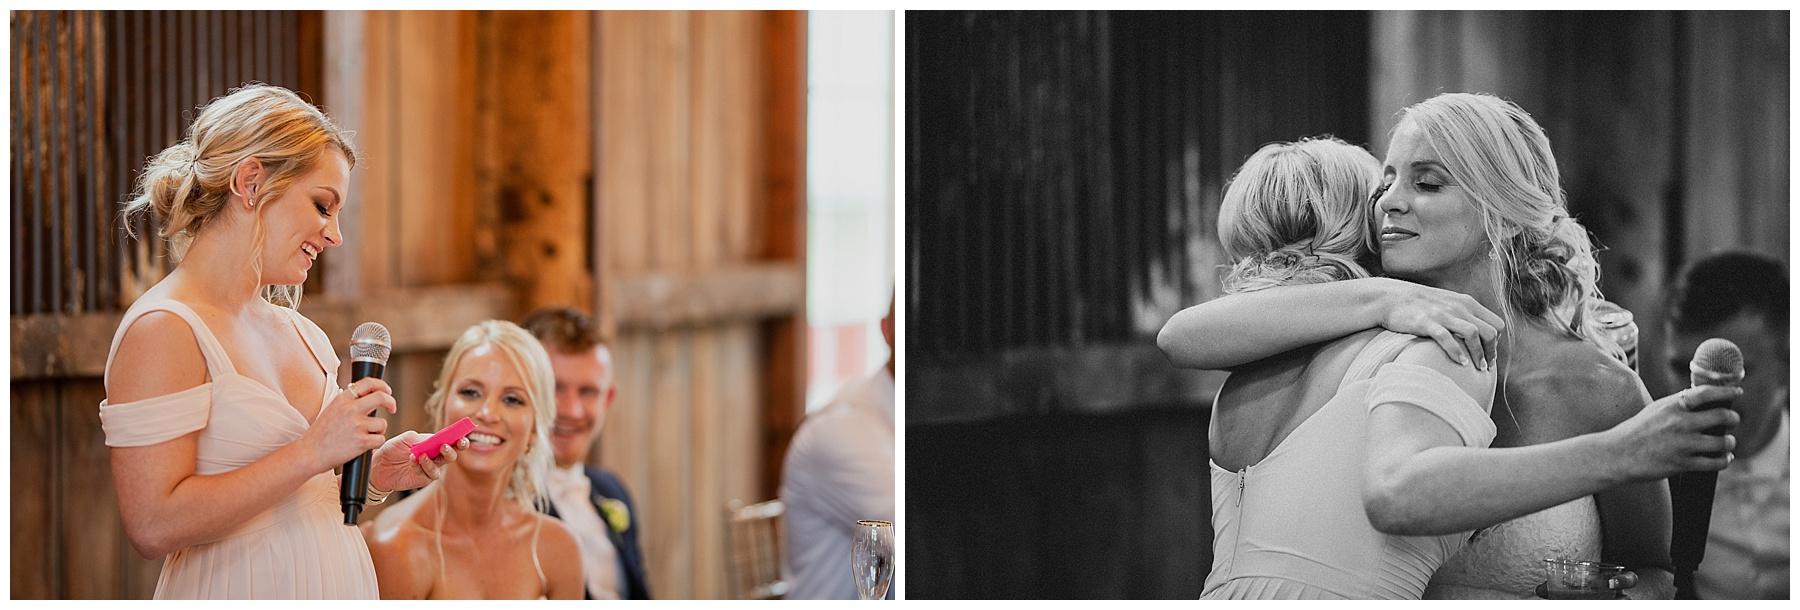 WISCONSIN WEDDING PHOTOGRAPHER 164.jpg